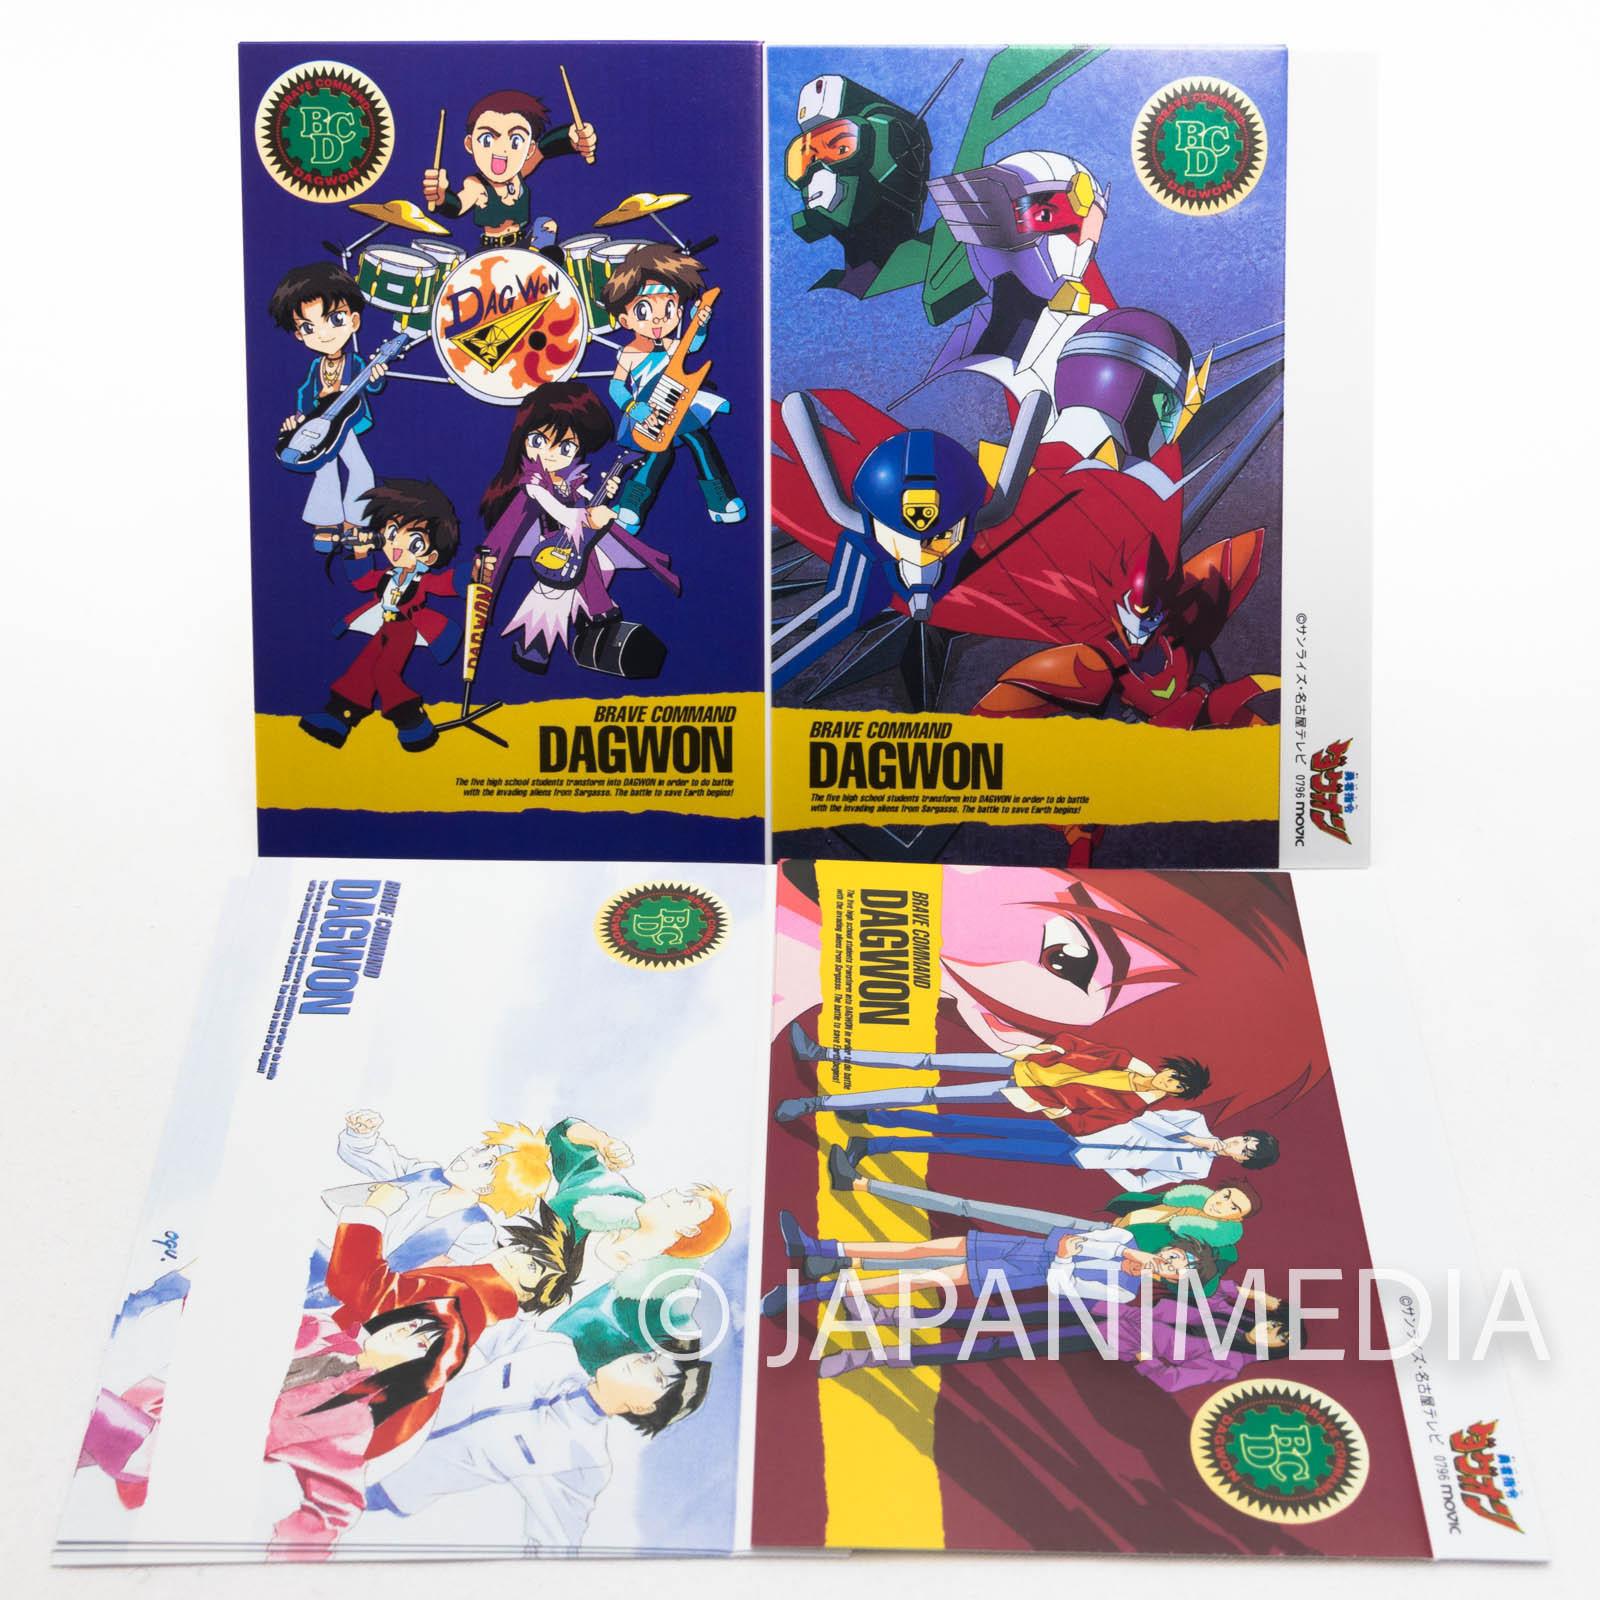 Brave Command Dagwon Cassette Index Card 12 Sheet JAPAN ANIME